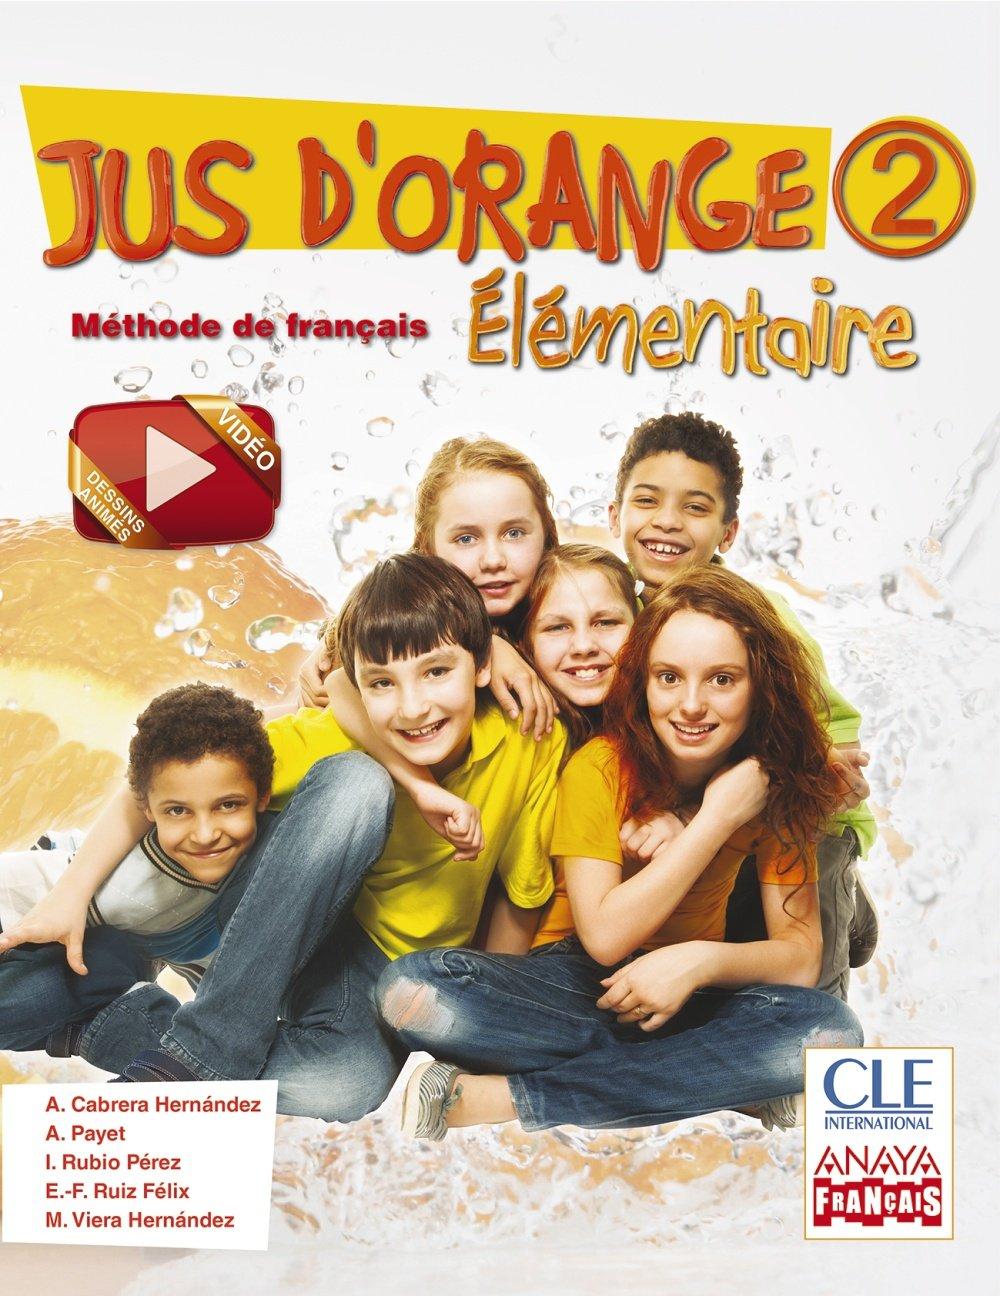 Jus d ' orange 2. Élémentaire. (Anaya Français) - 9788466790109 Tapa blanda – 11 abr 2014 CLE International ANAYA EDUCACIÓN 8466790101 YQ